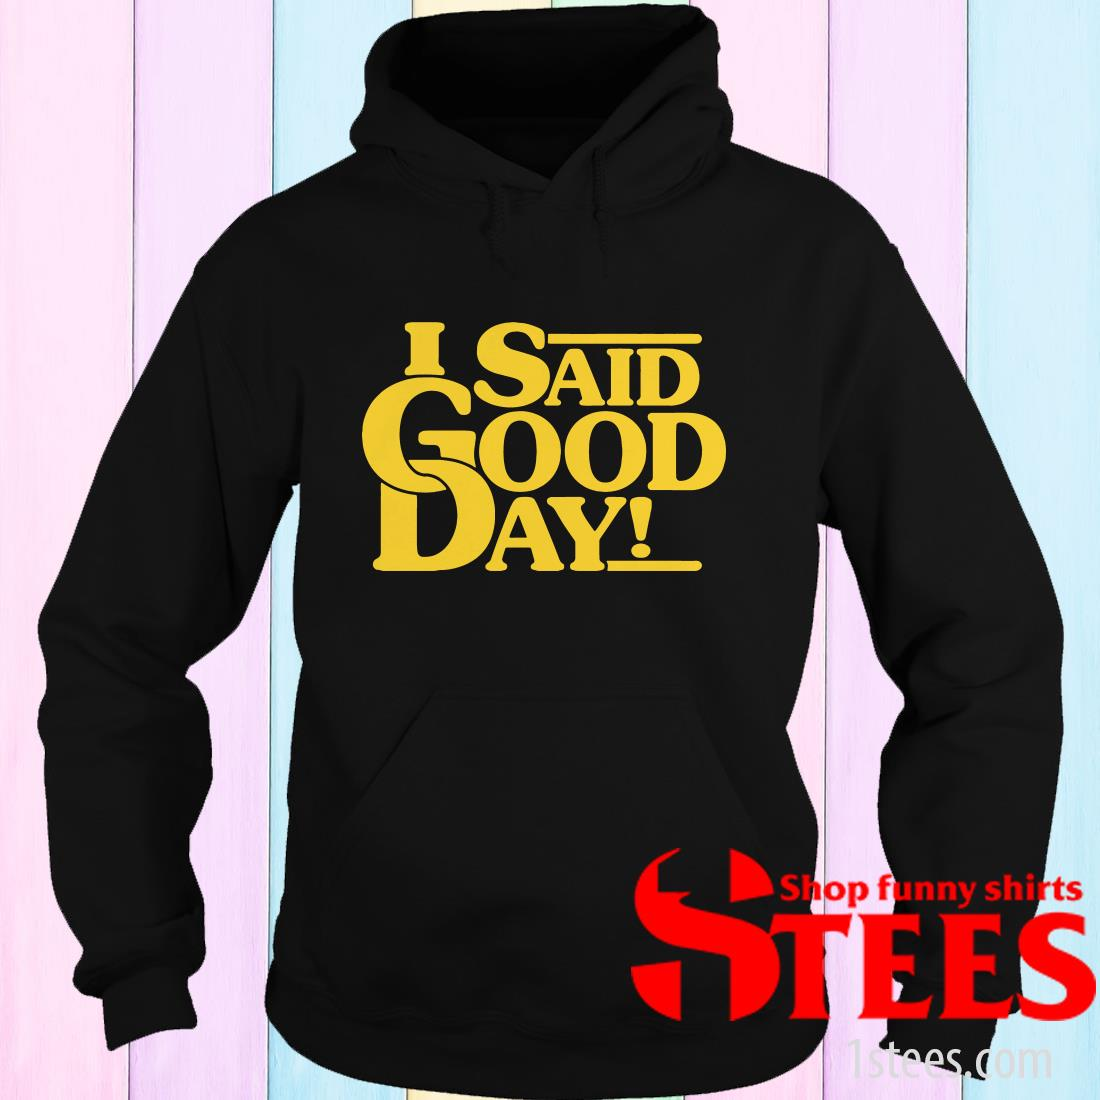 I Said Good Day Hoodies